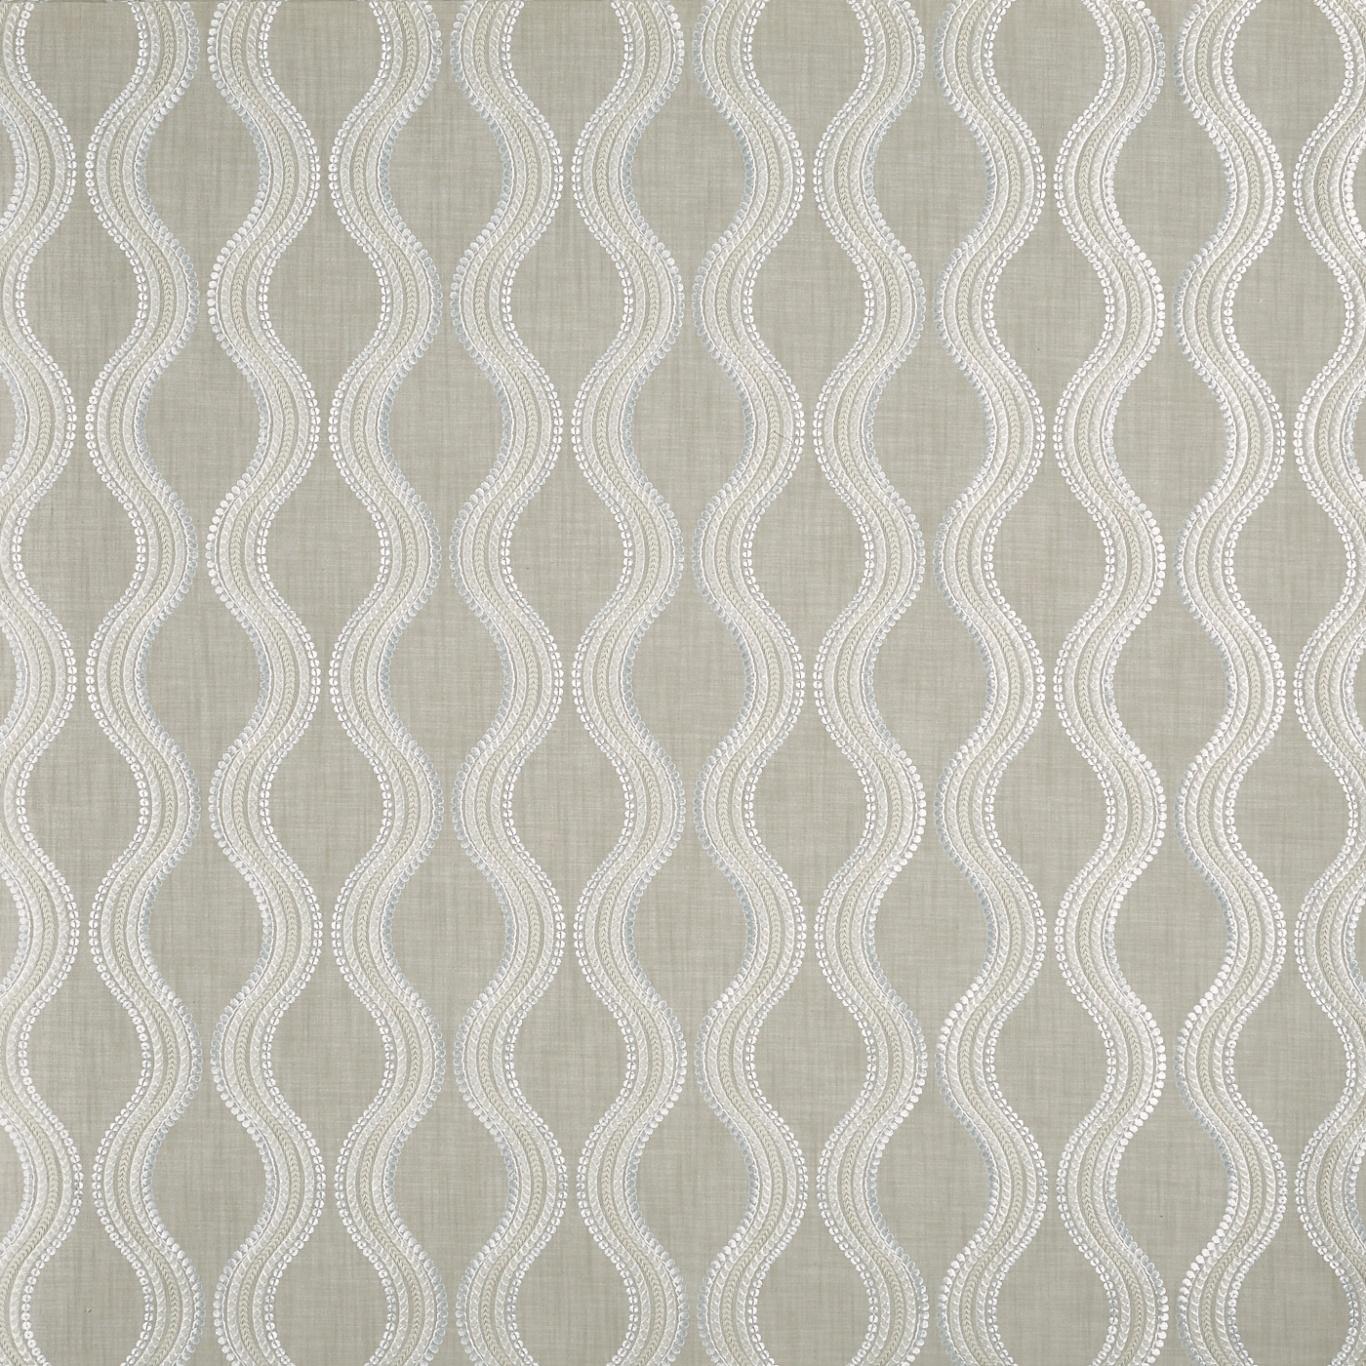 Image of Prestigious Windsor Parchment Fabric 3762/022